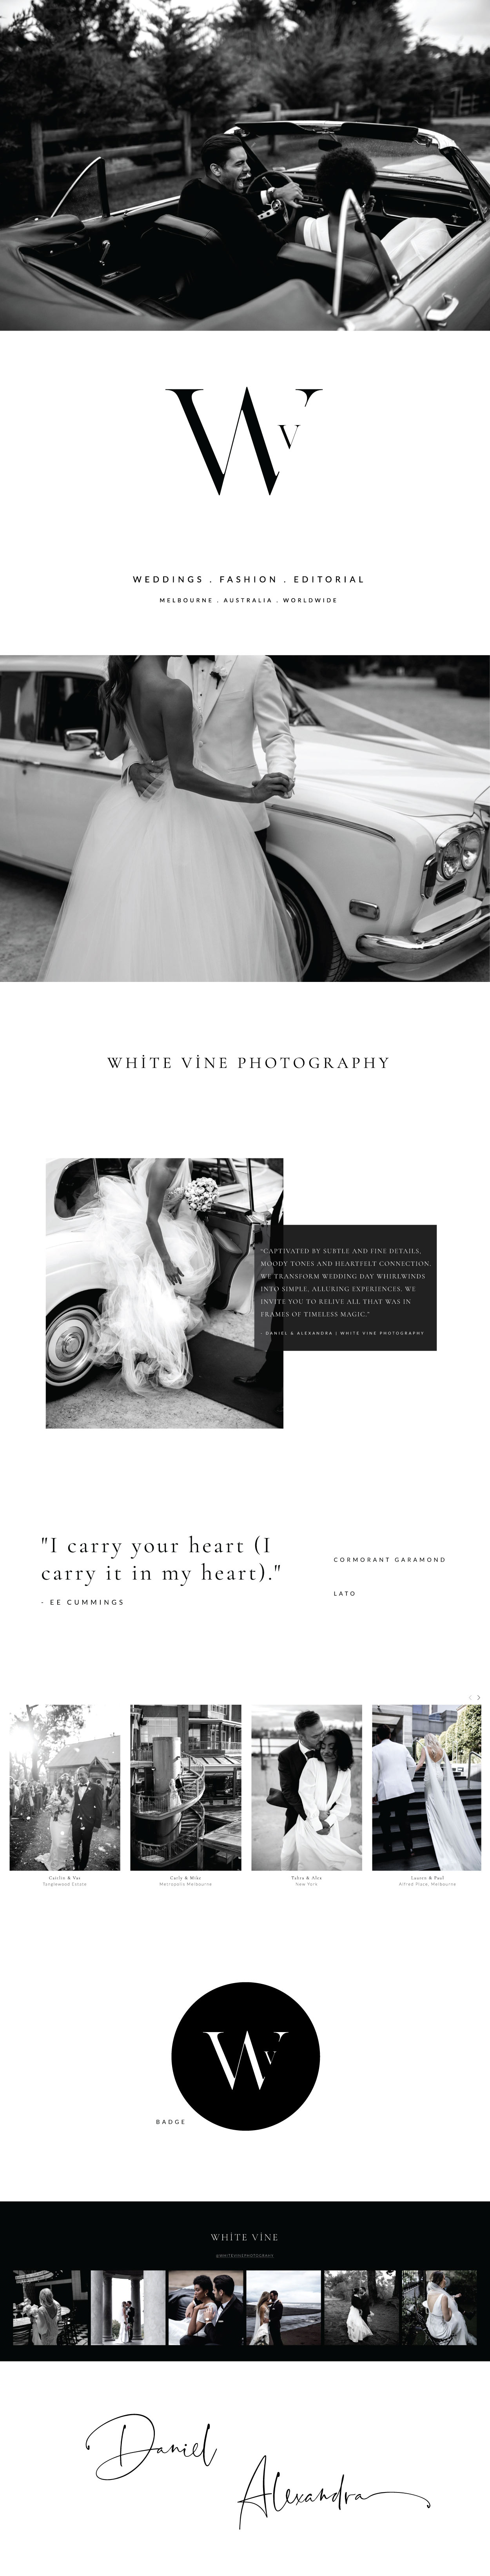 IMO-CREATIVE-Branding-and-Squarespace-Website-Design-Melbourne-White-Vine-Photography---wedding-Photographers-2.jpg